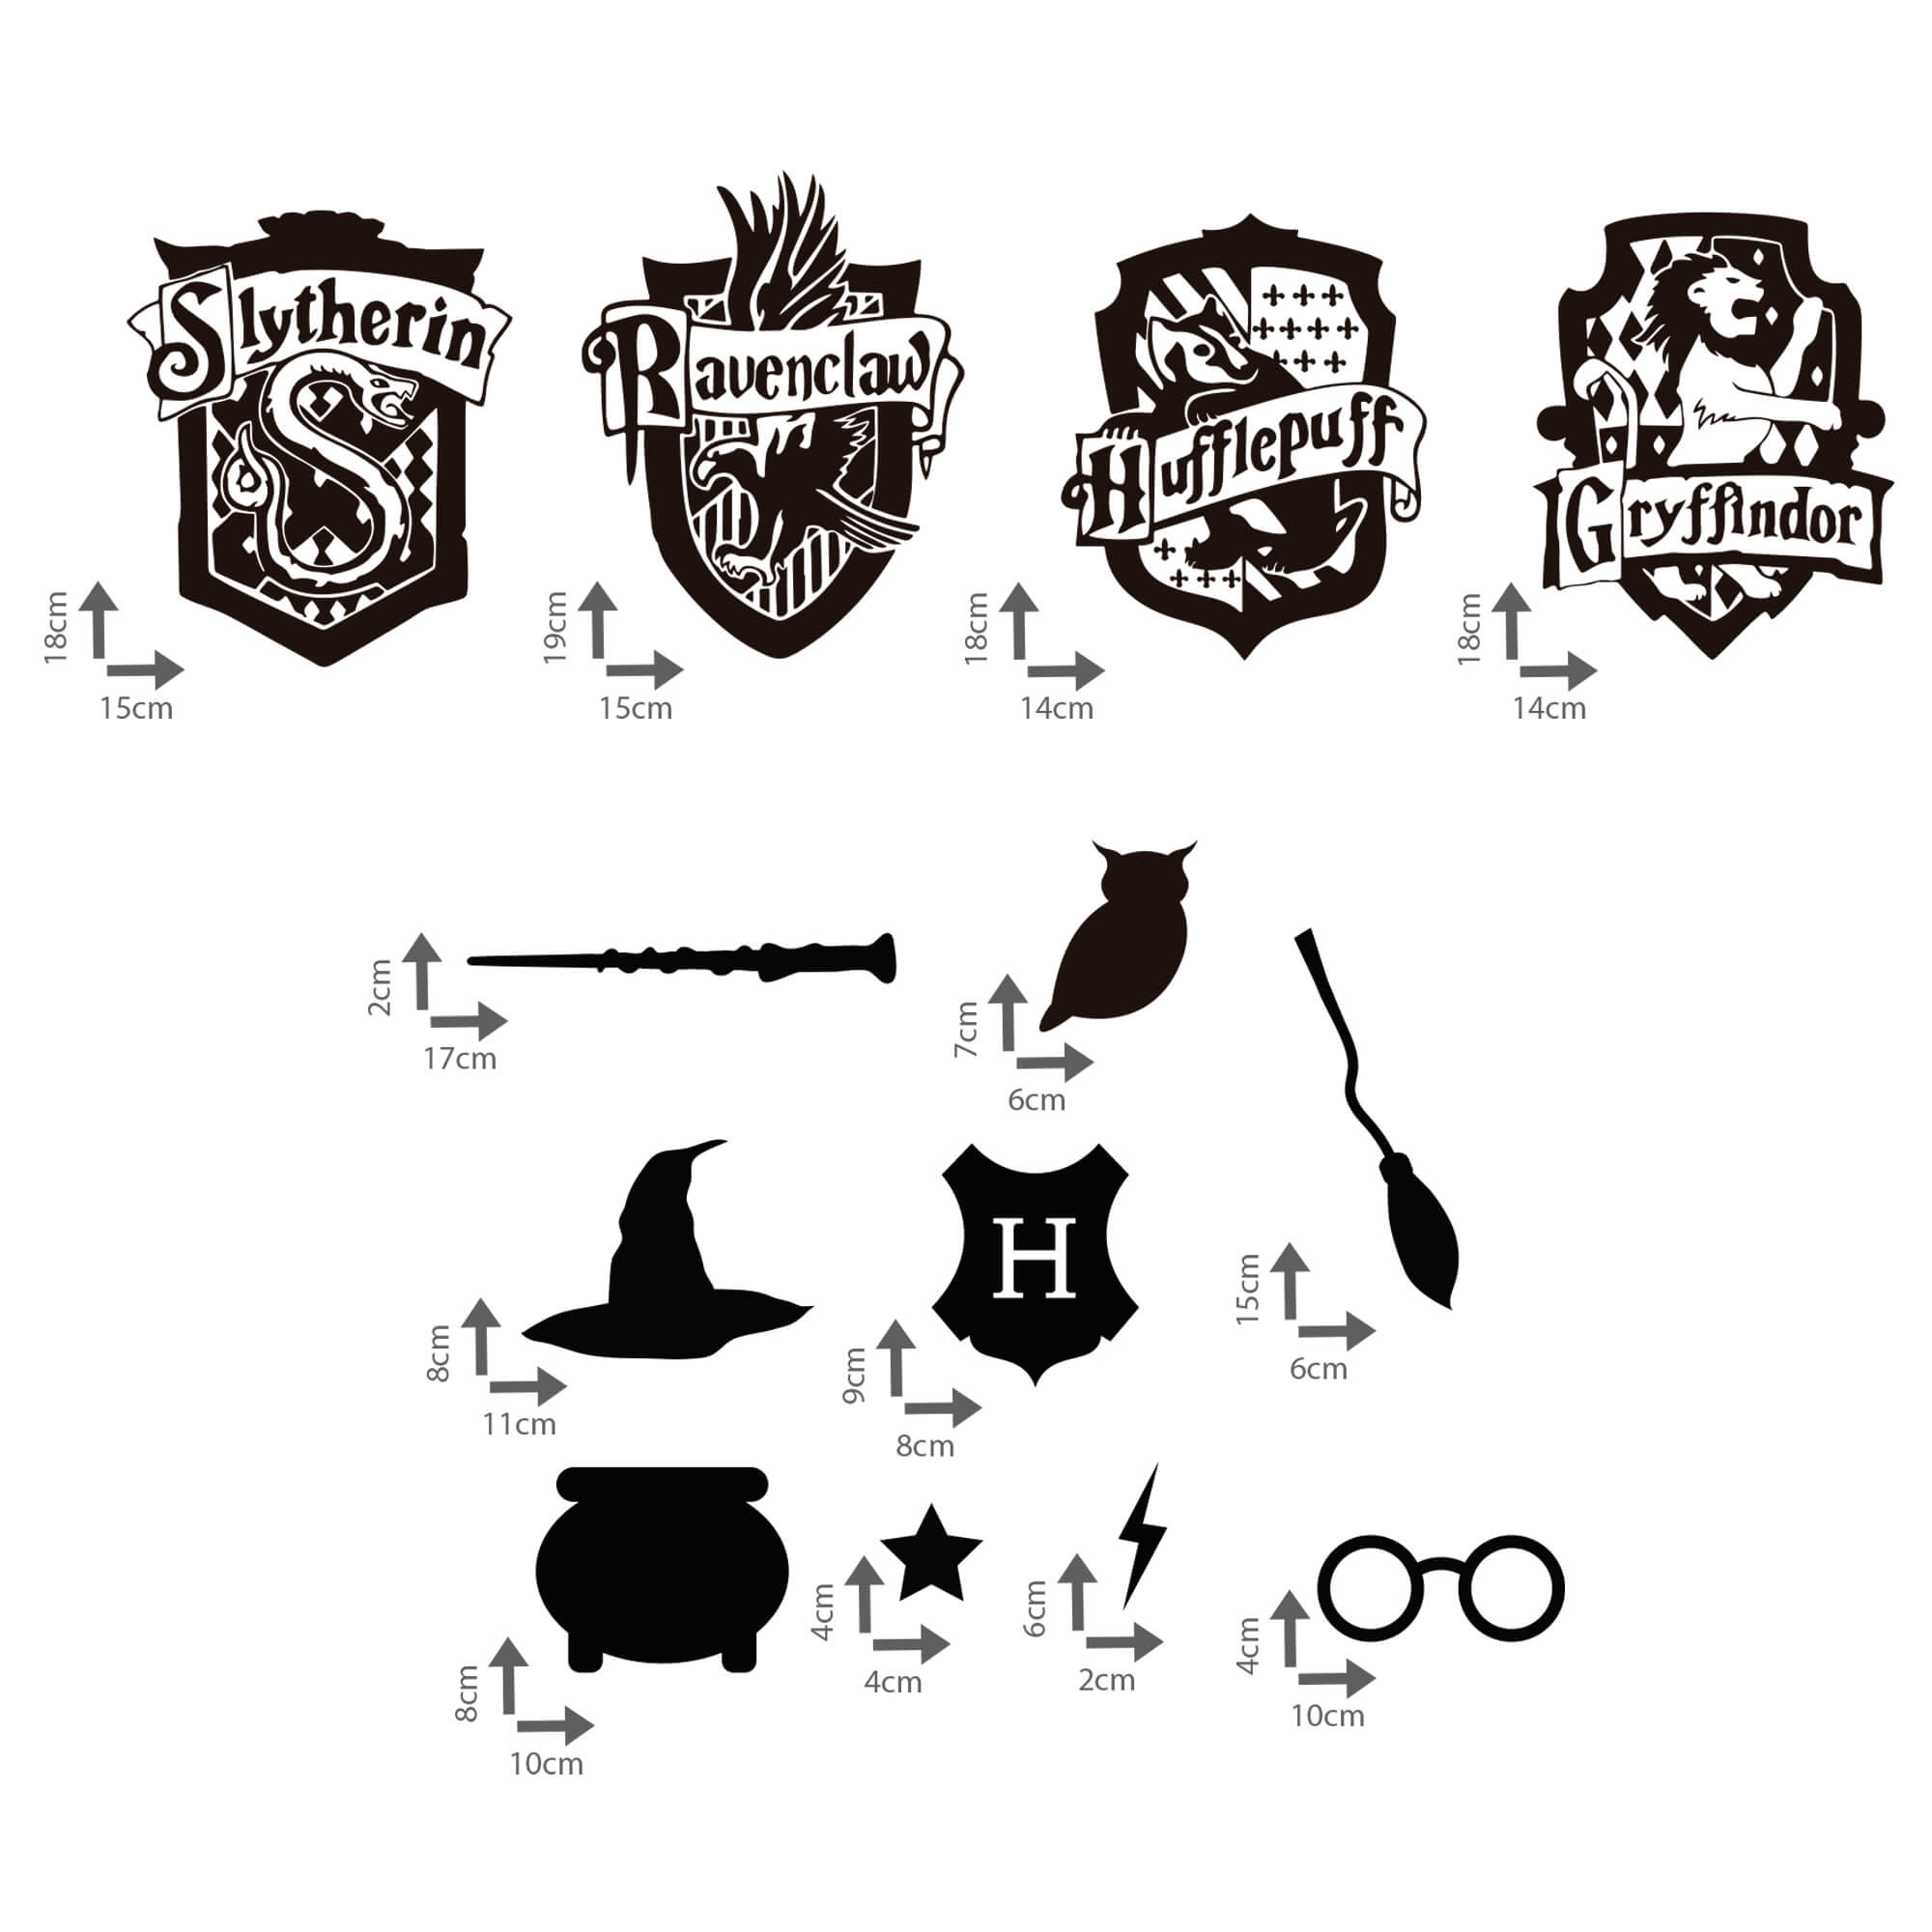 Kit de Adesivos Brasões Casas Harry Potter Grifinória Lufa-Lufa Sonserina Corvinal Elementos Hogawarts